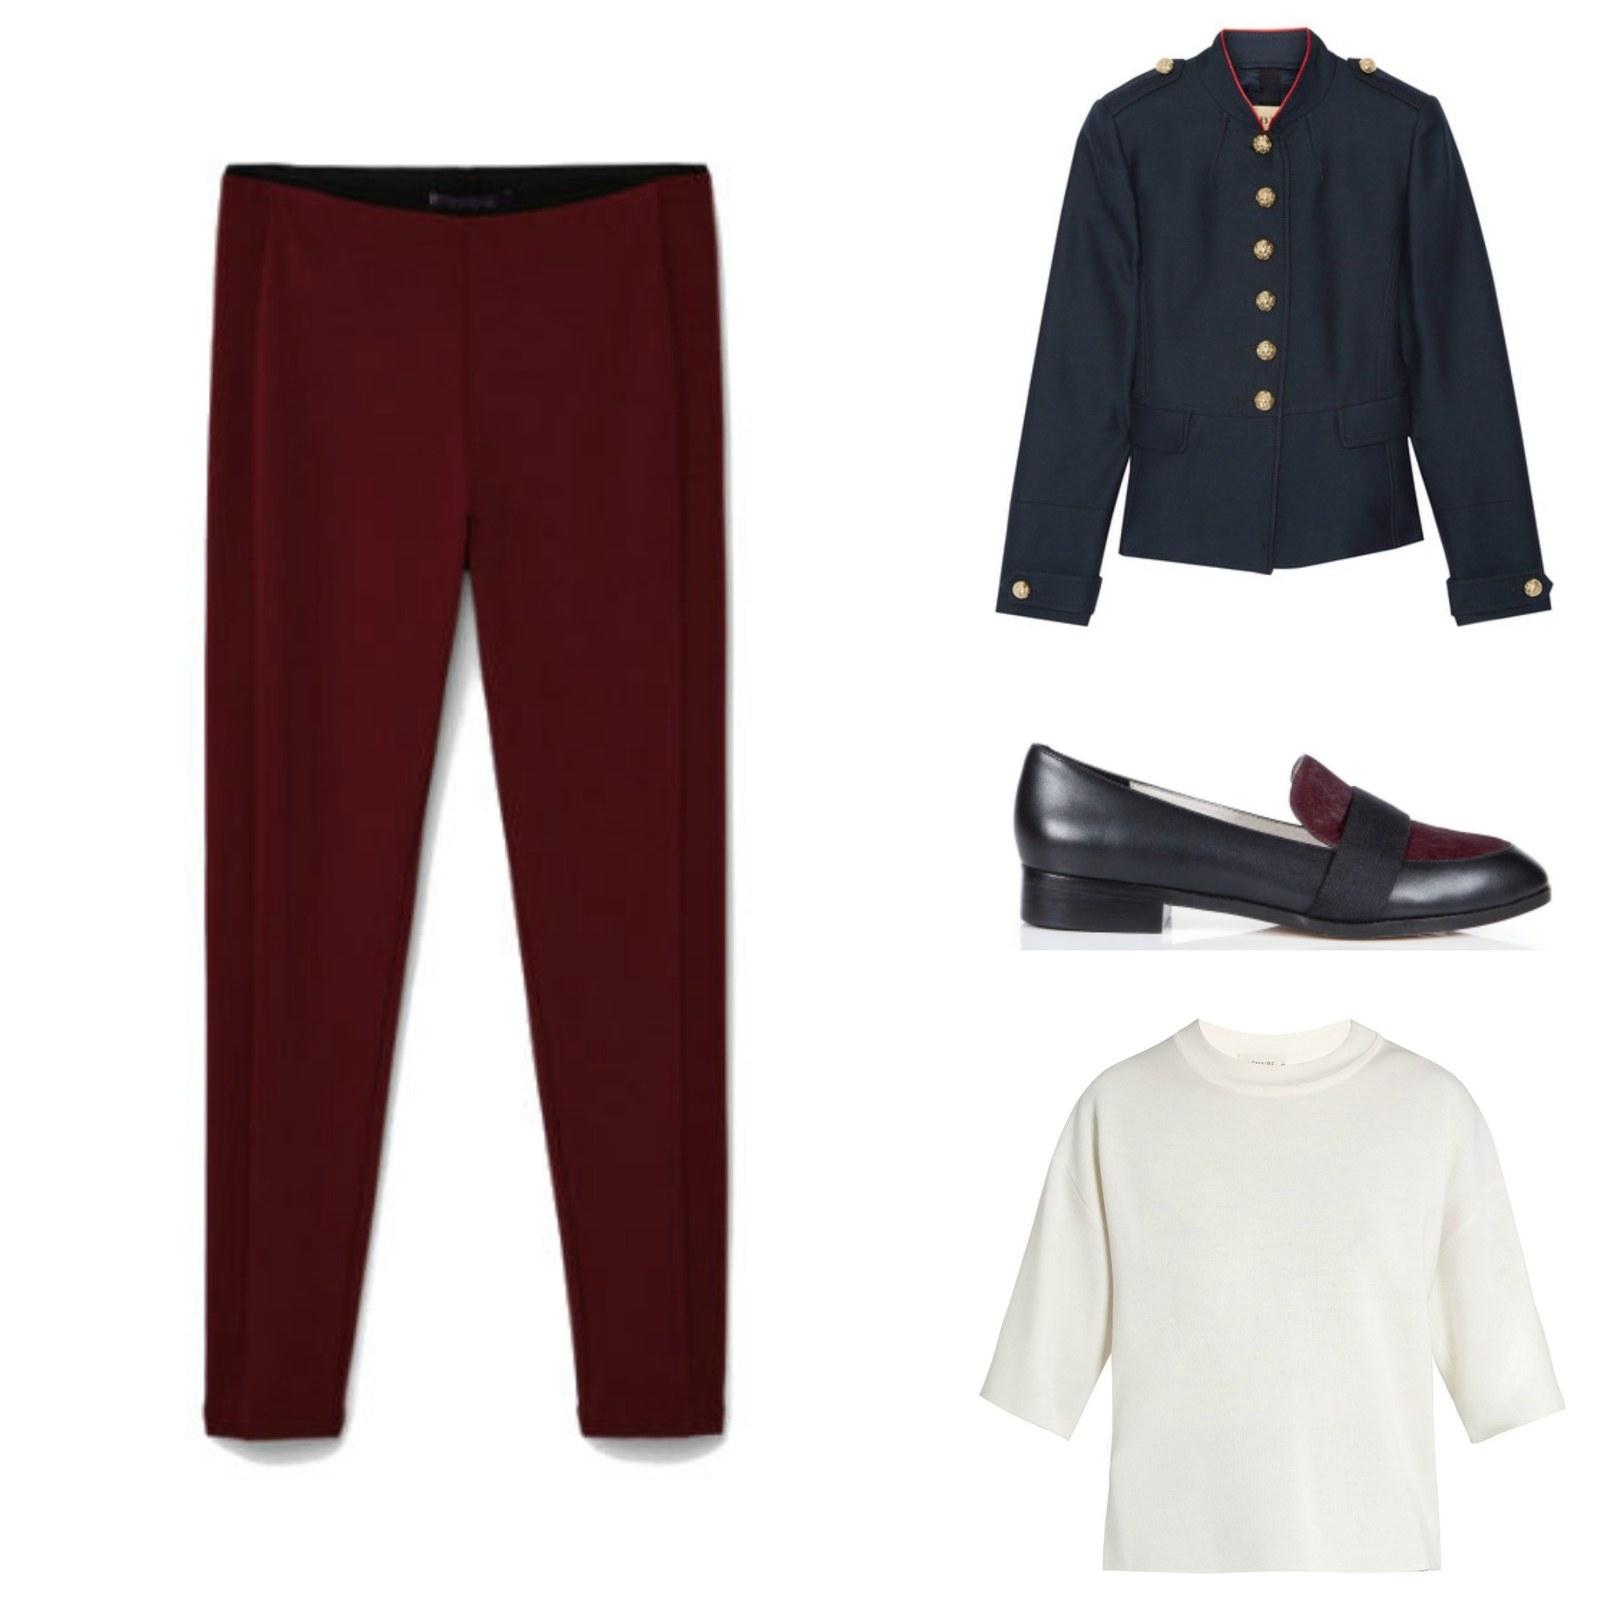 burgundy-leggings-black-jacket-blazer-black-shoe-loafers-white-sweater-fall-winter-office-work.jpg